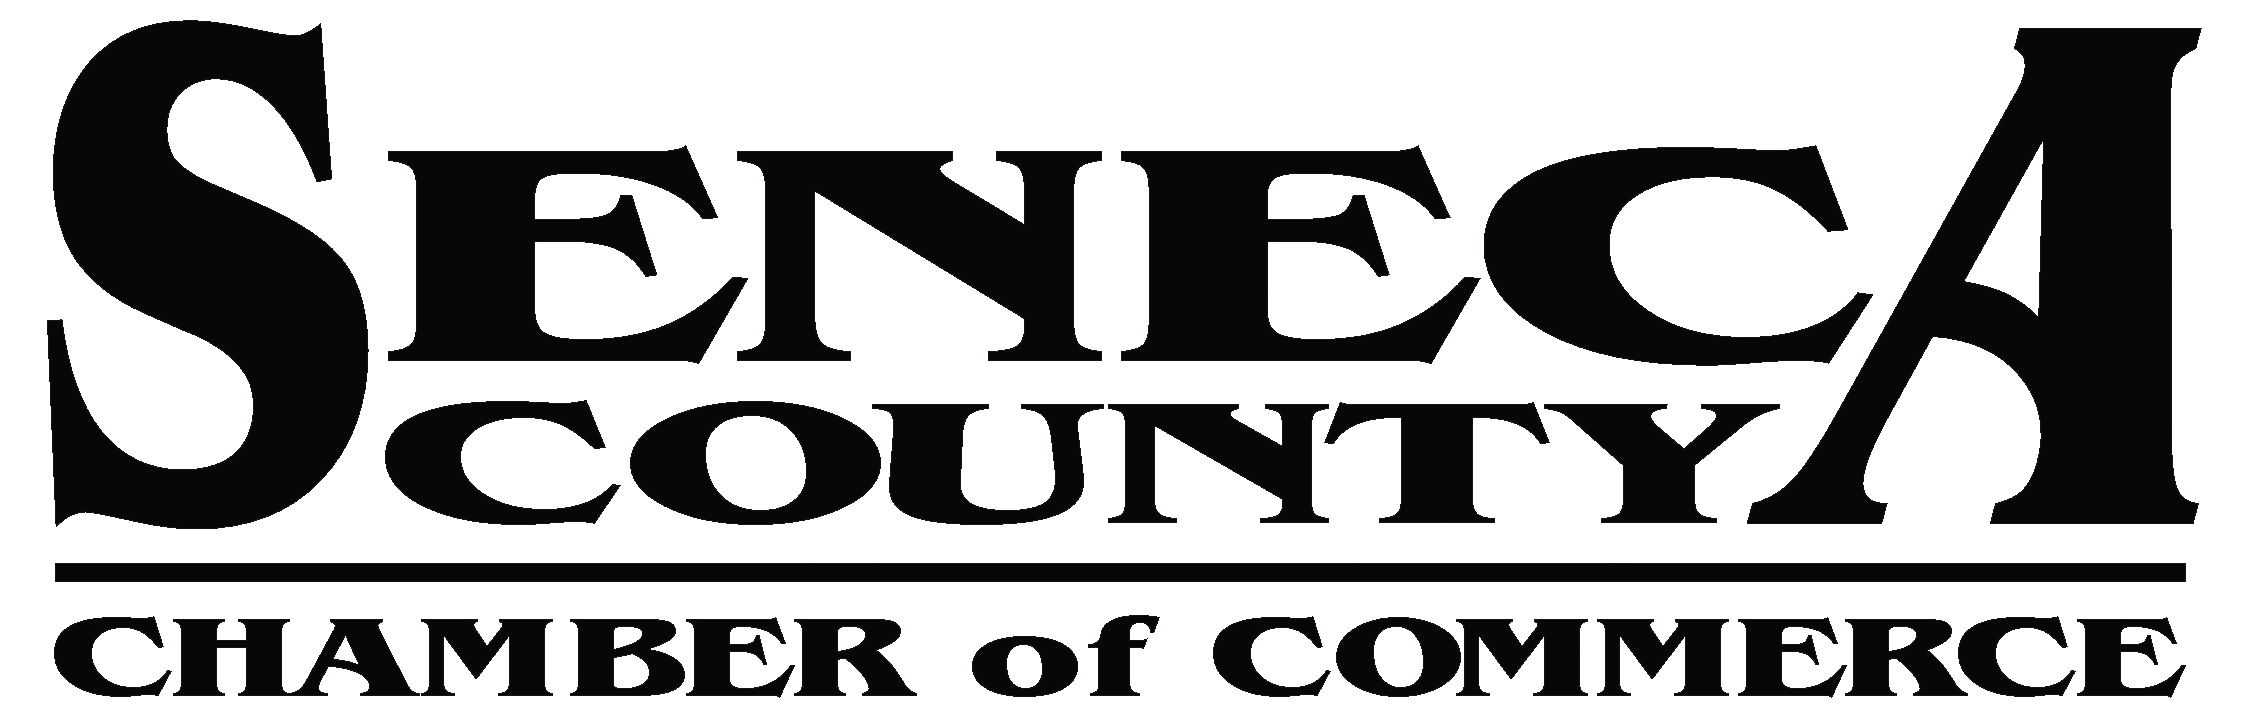 Seneca County Tourism Website Getting Fresh Look Soon